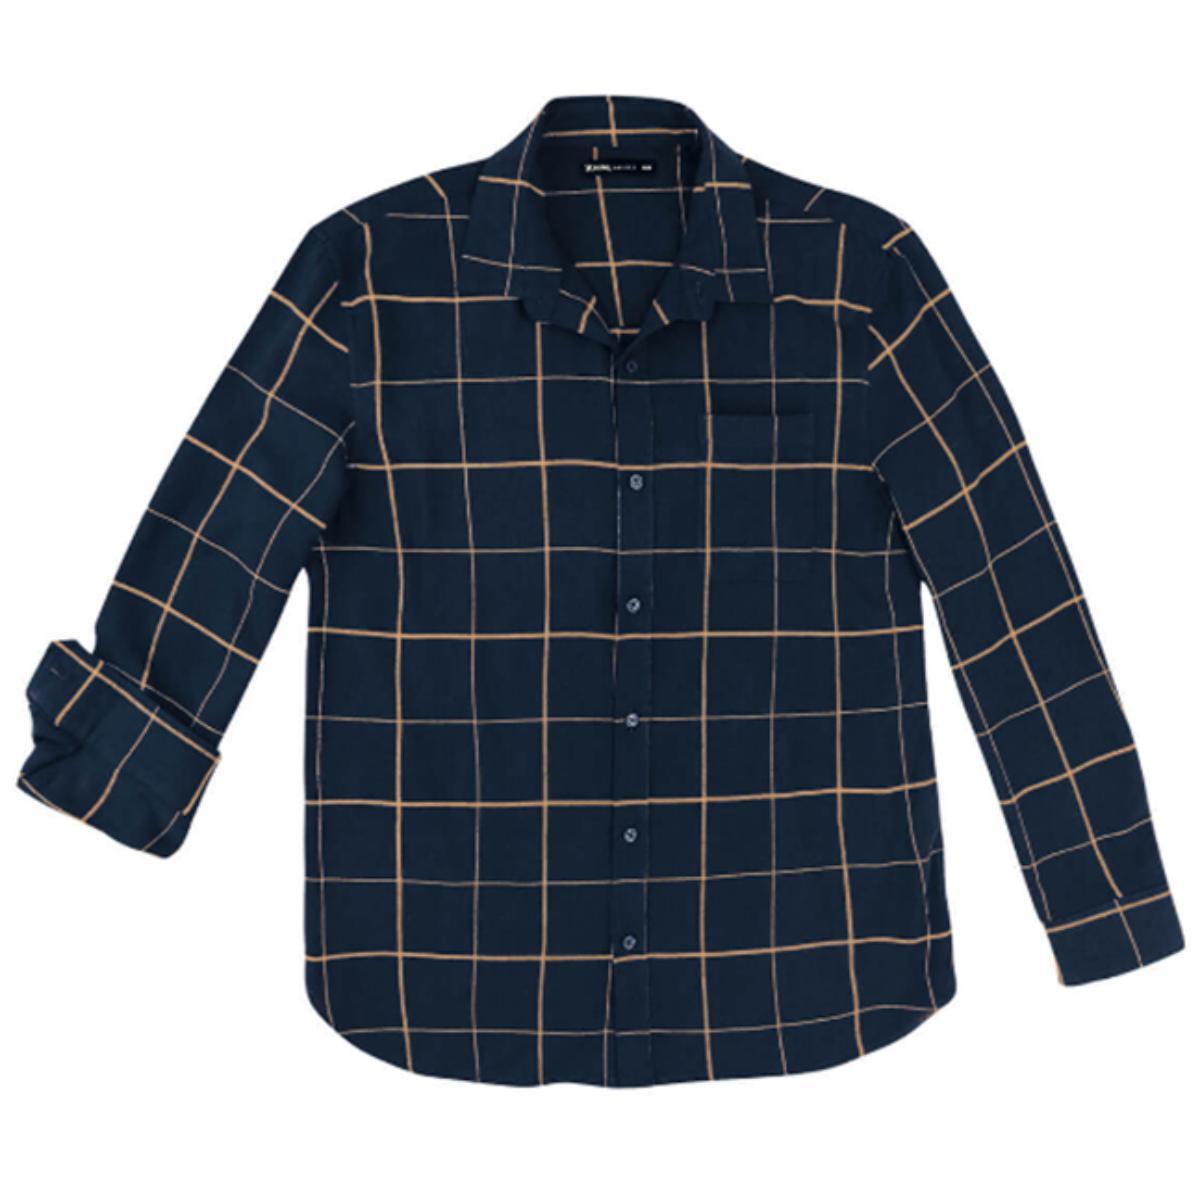 Camisa Masculina Hering Ktzc 1asi Marinho Xadrez